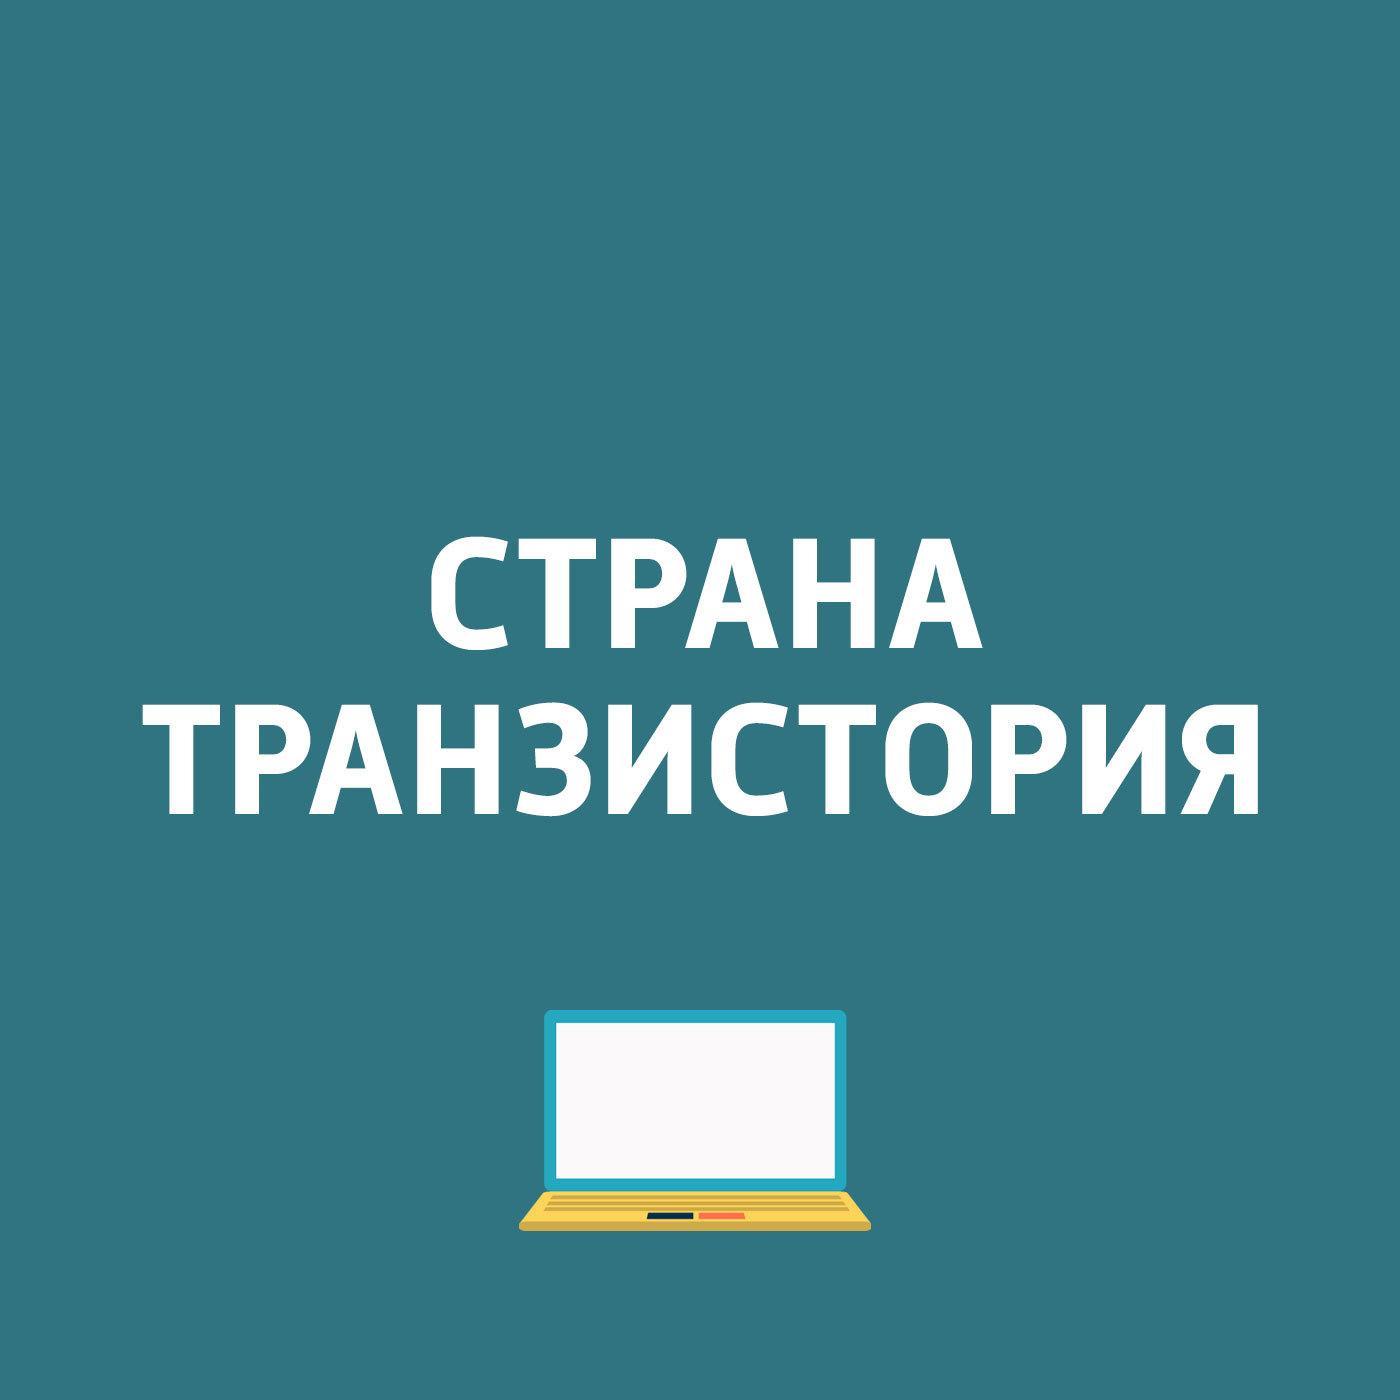 Картаев Павел Samsung Galaxy Note 8 получит кодовое имя «Байкал, С нового iPhone слезает краска 28wh new laptop battery for lenovo thinkpad x1 helix tablet pc 45n1100 45n1101 41cp3 71 90